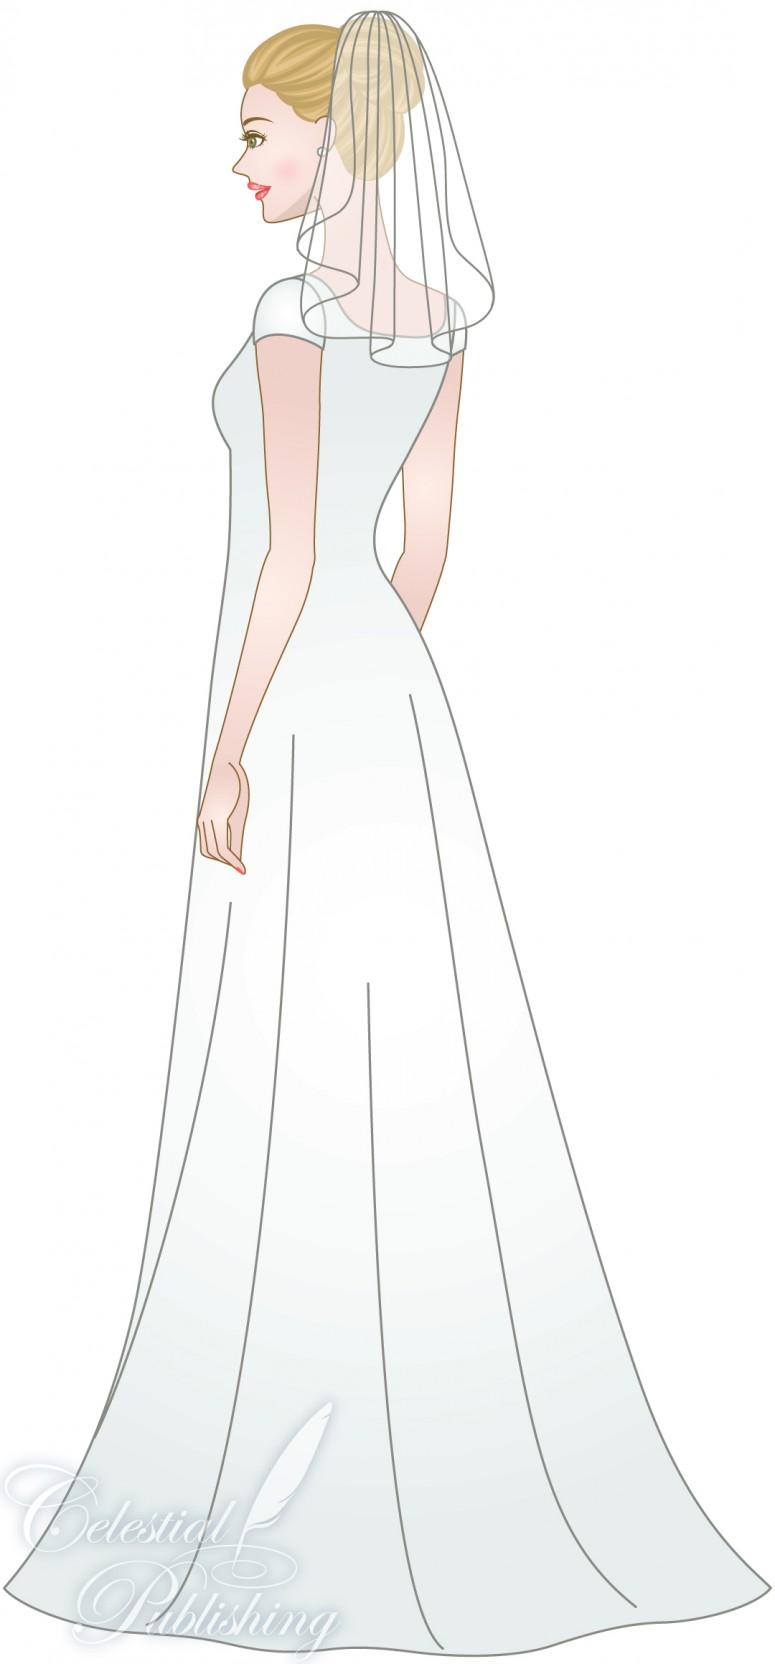 Modest Wedding Dresses, LDS temple weddings, WeddingLDS.com's signature bride modeling shoulder lenght veil